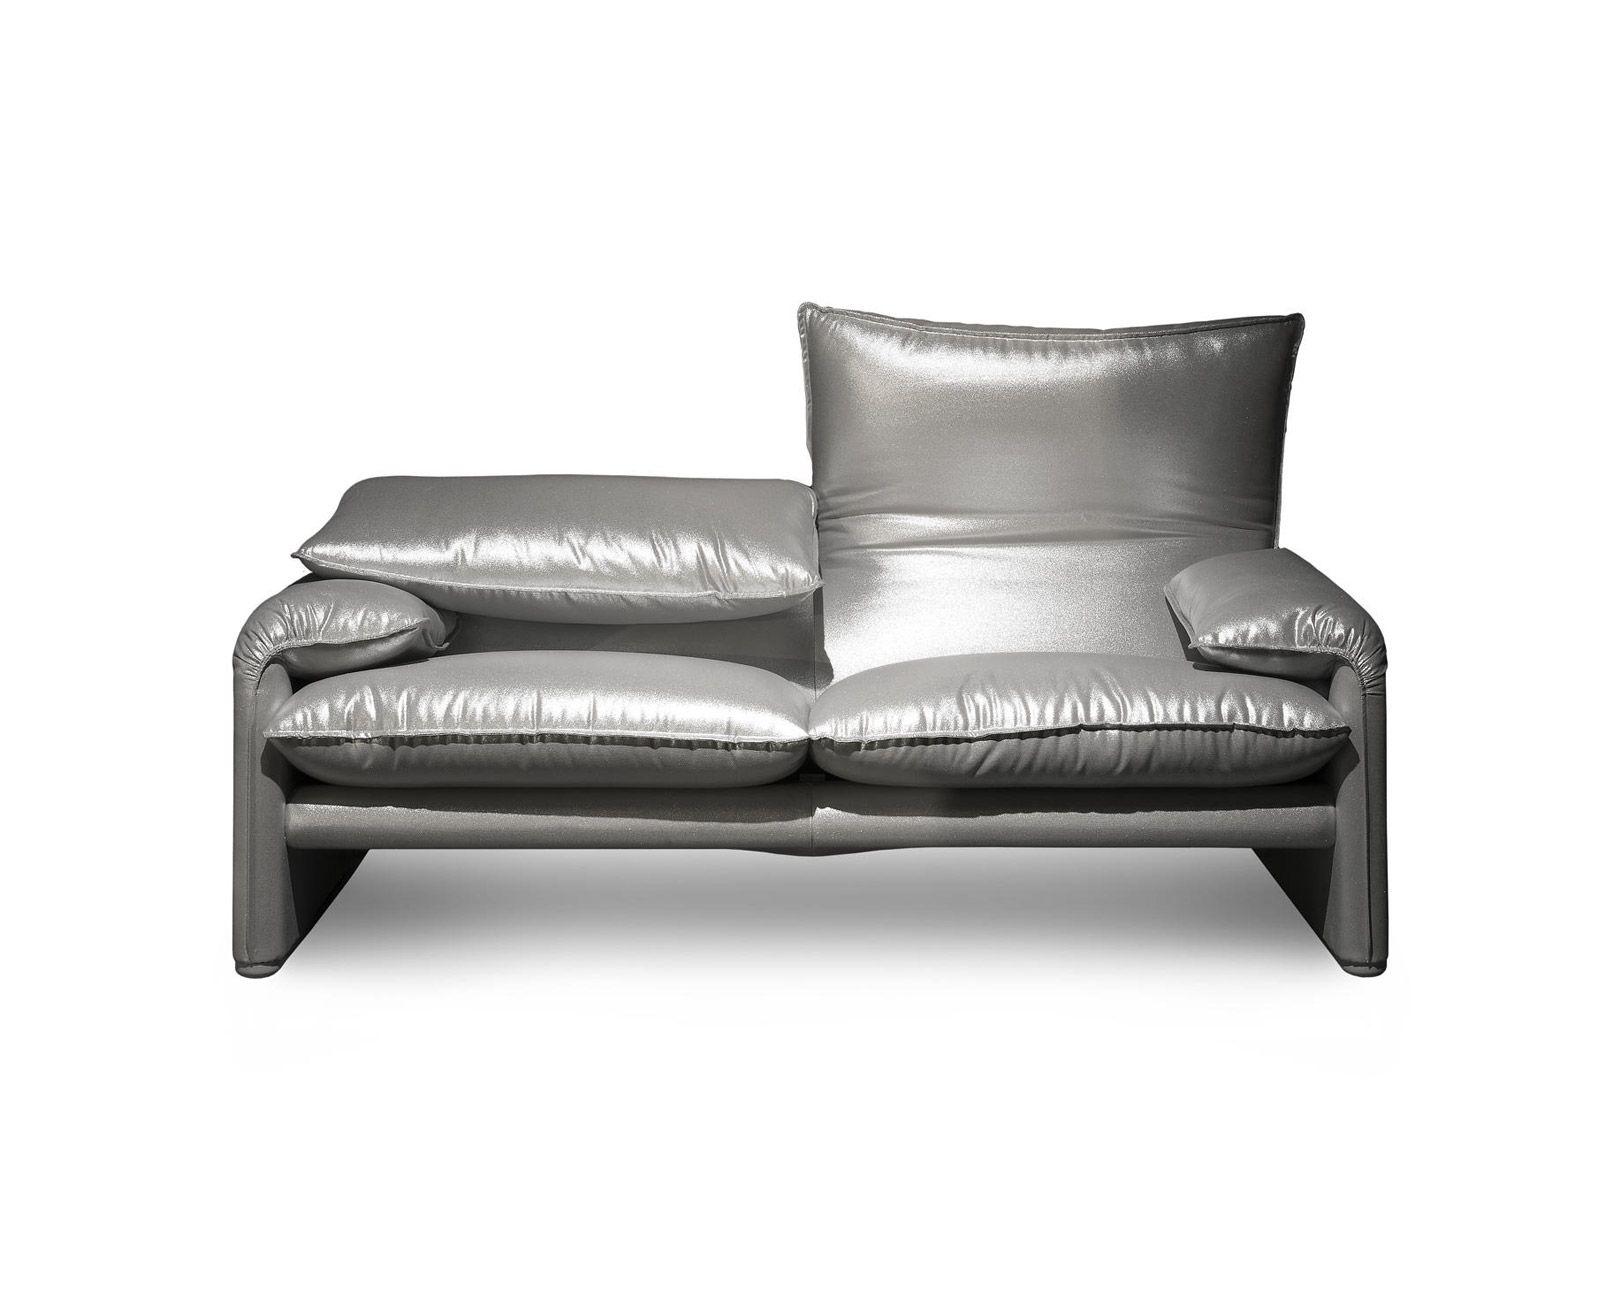 Maralunga Forza Sofas Armchairs Pinterest Armchairs And  # Meuble Tv Forza